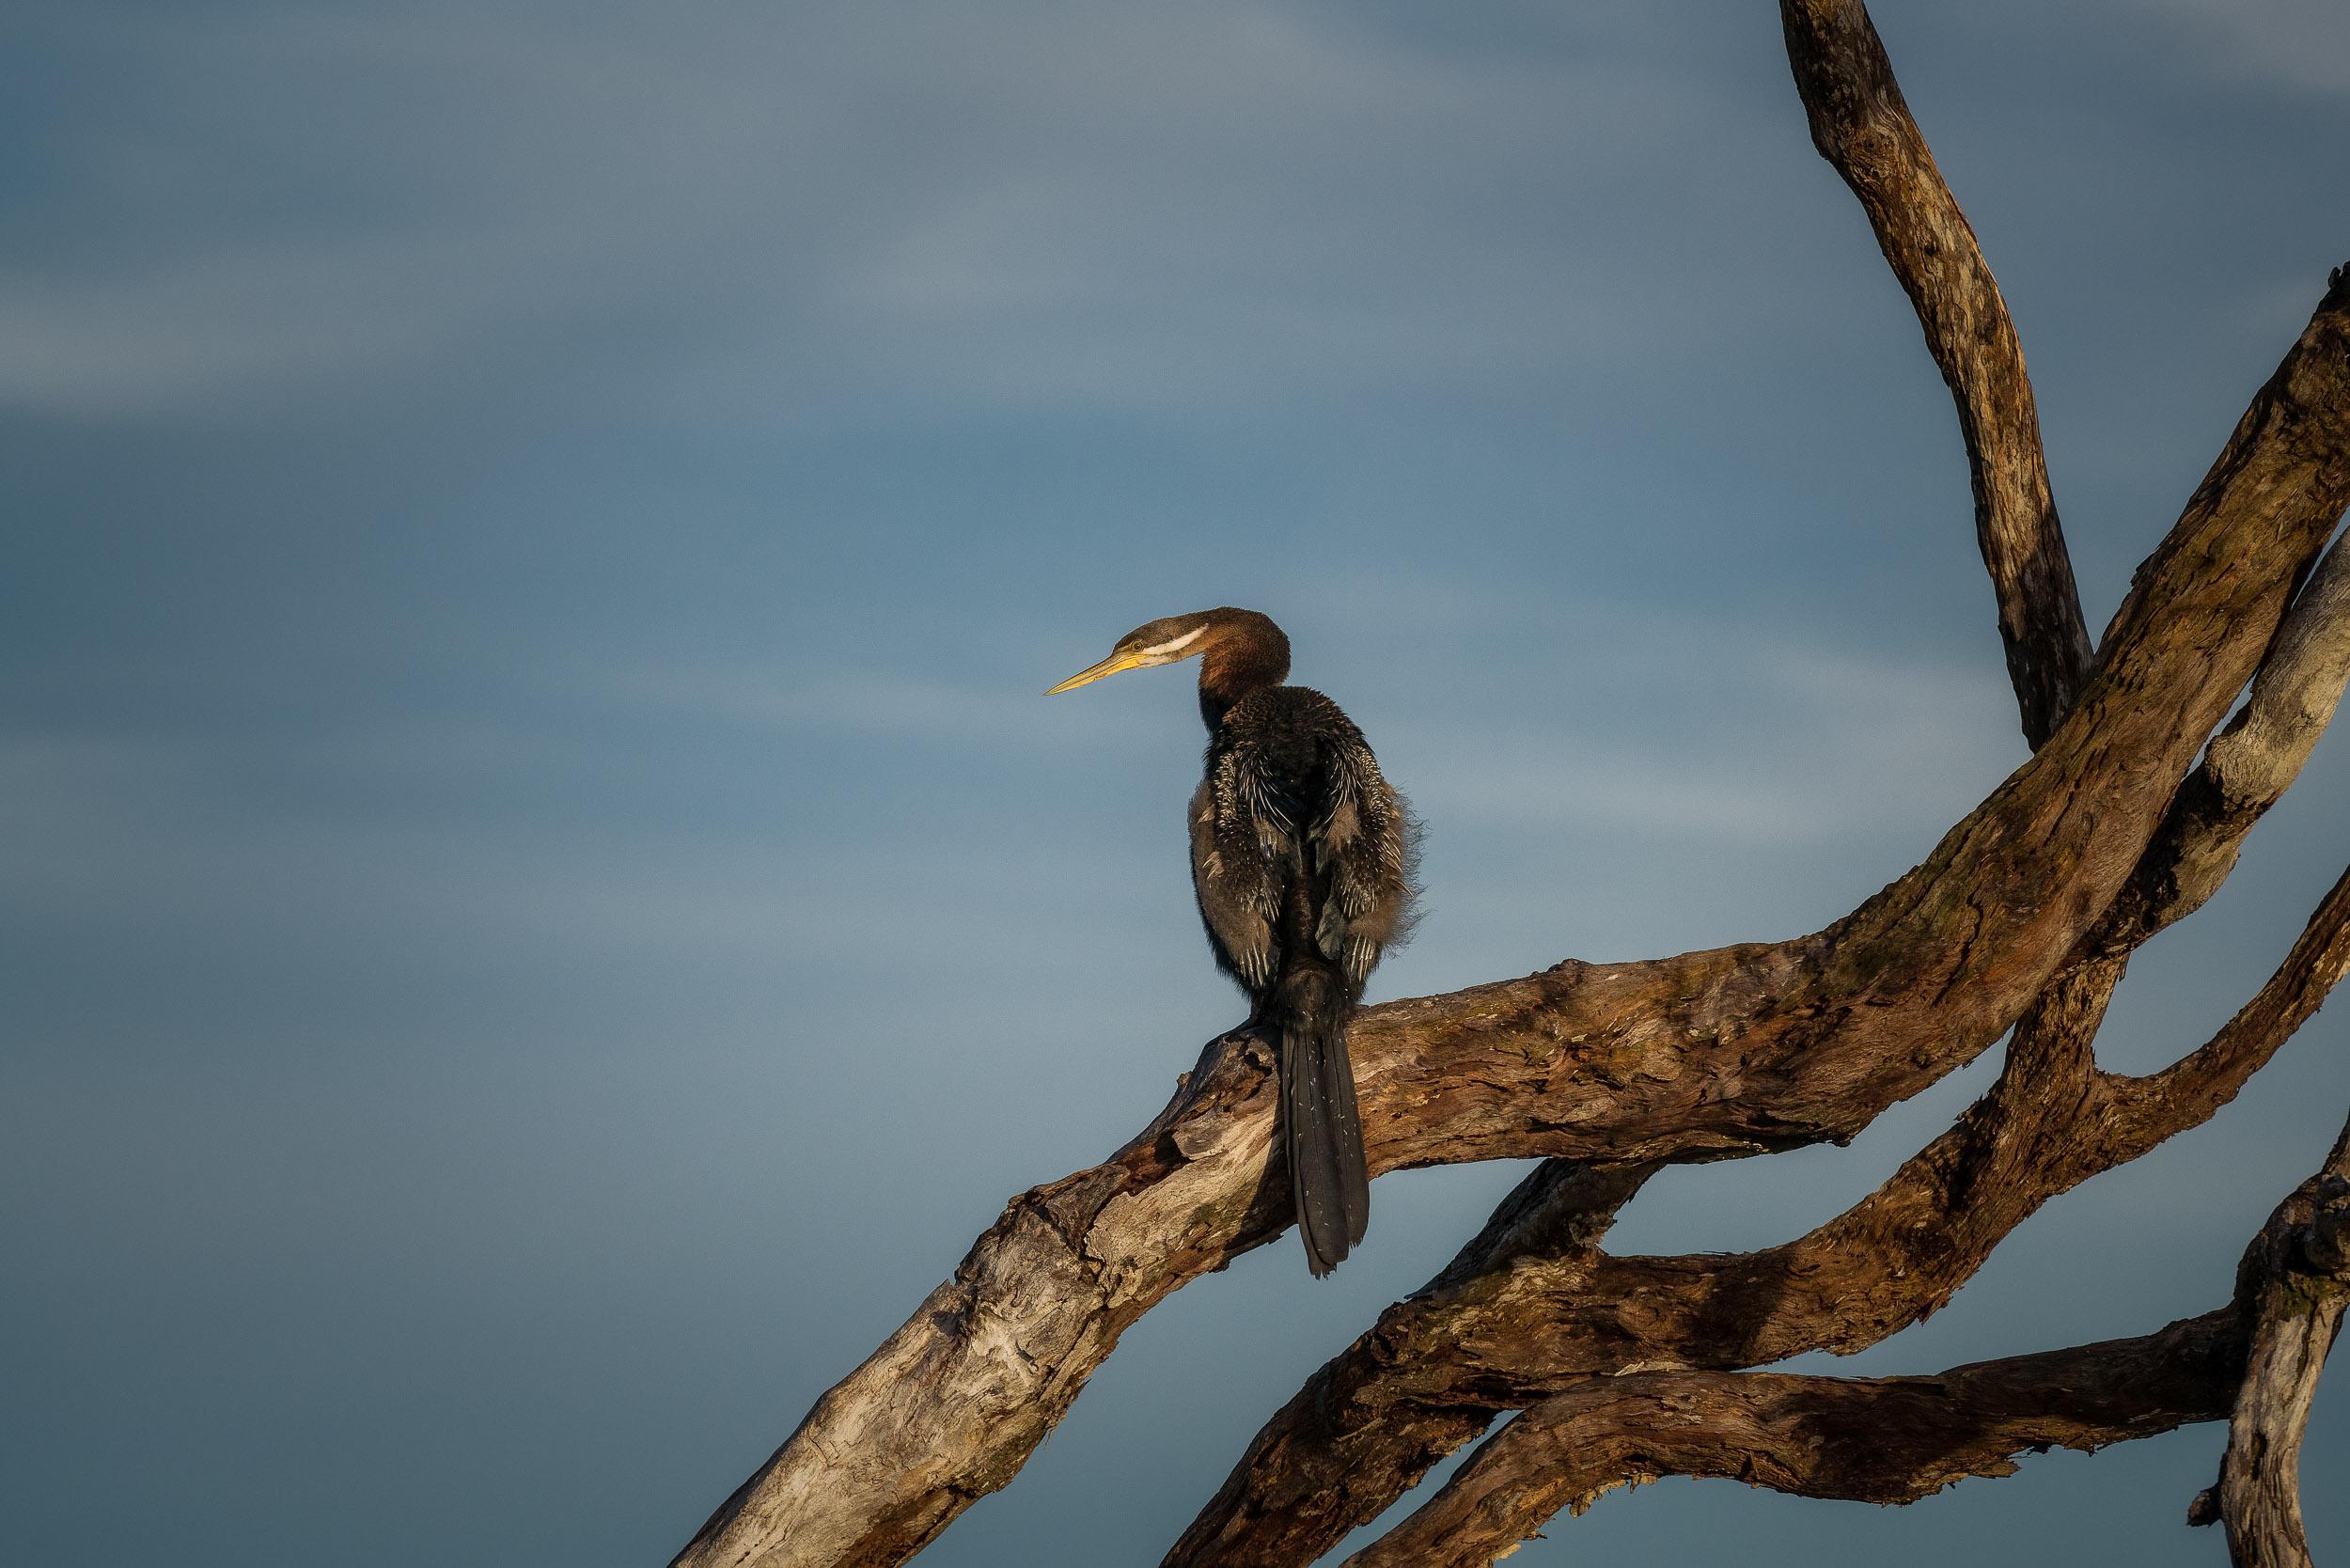 A  darter bird  resting on a tree branch above the  Yellow Waters Billabong  in  Kakadu National Park ,  Australia .